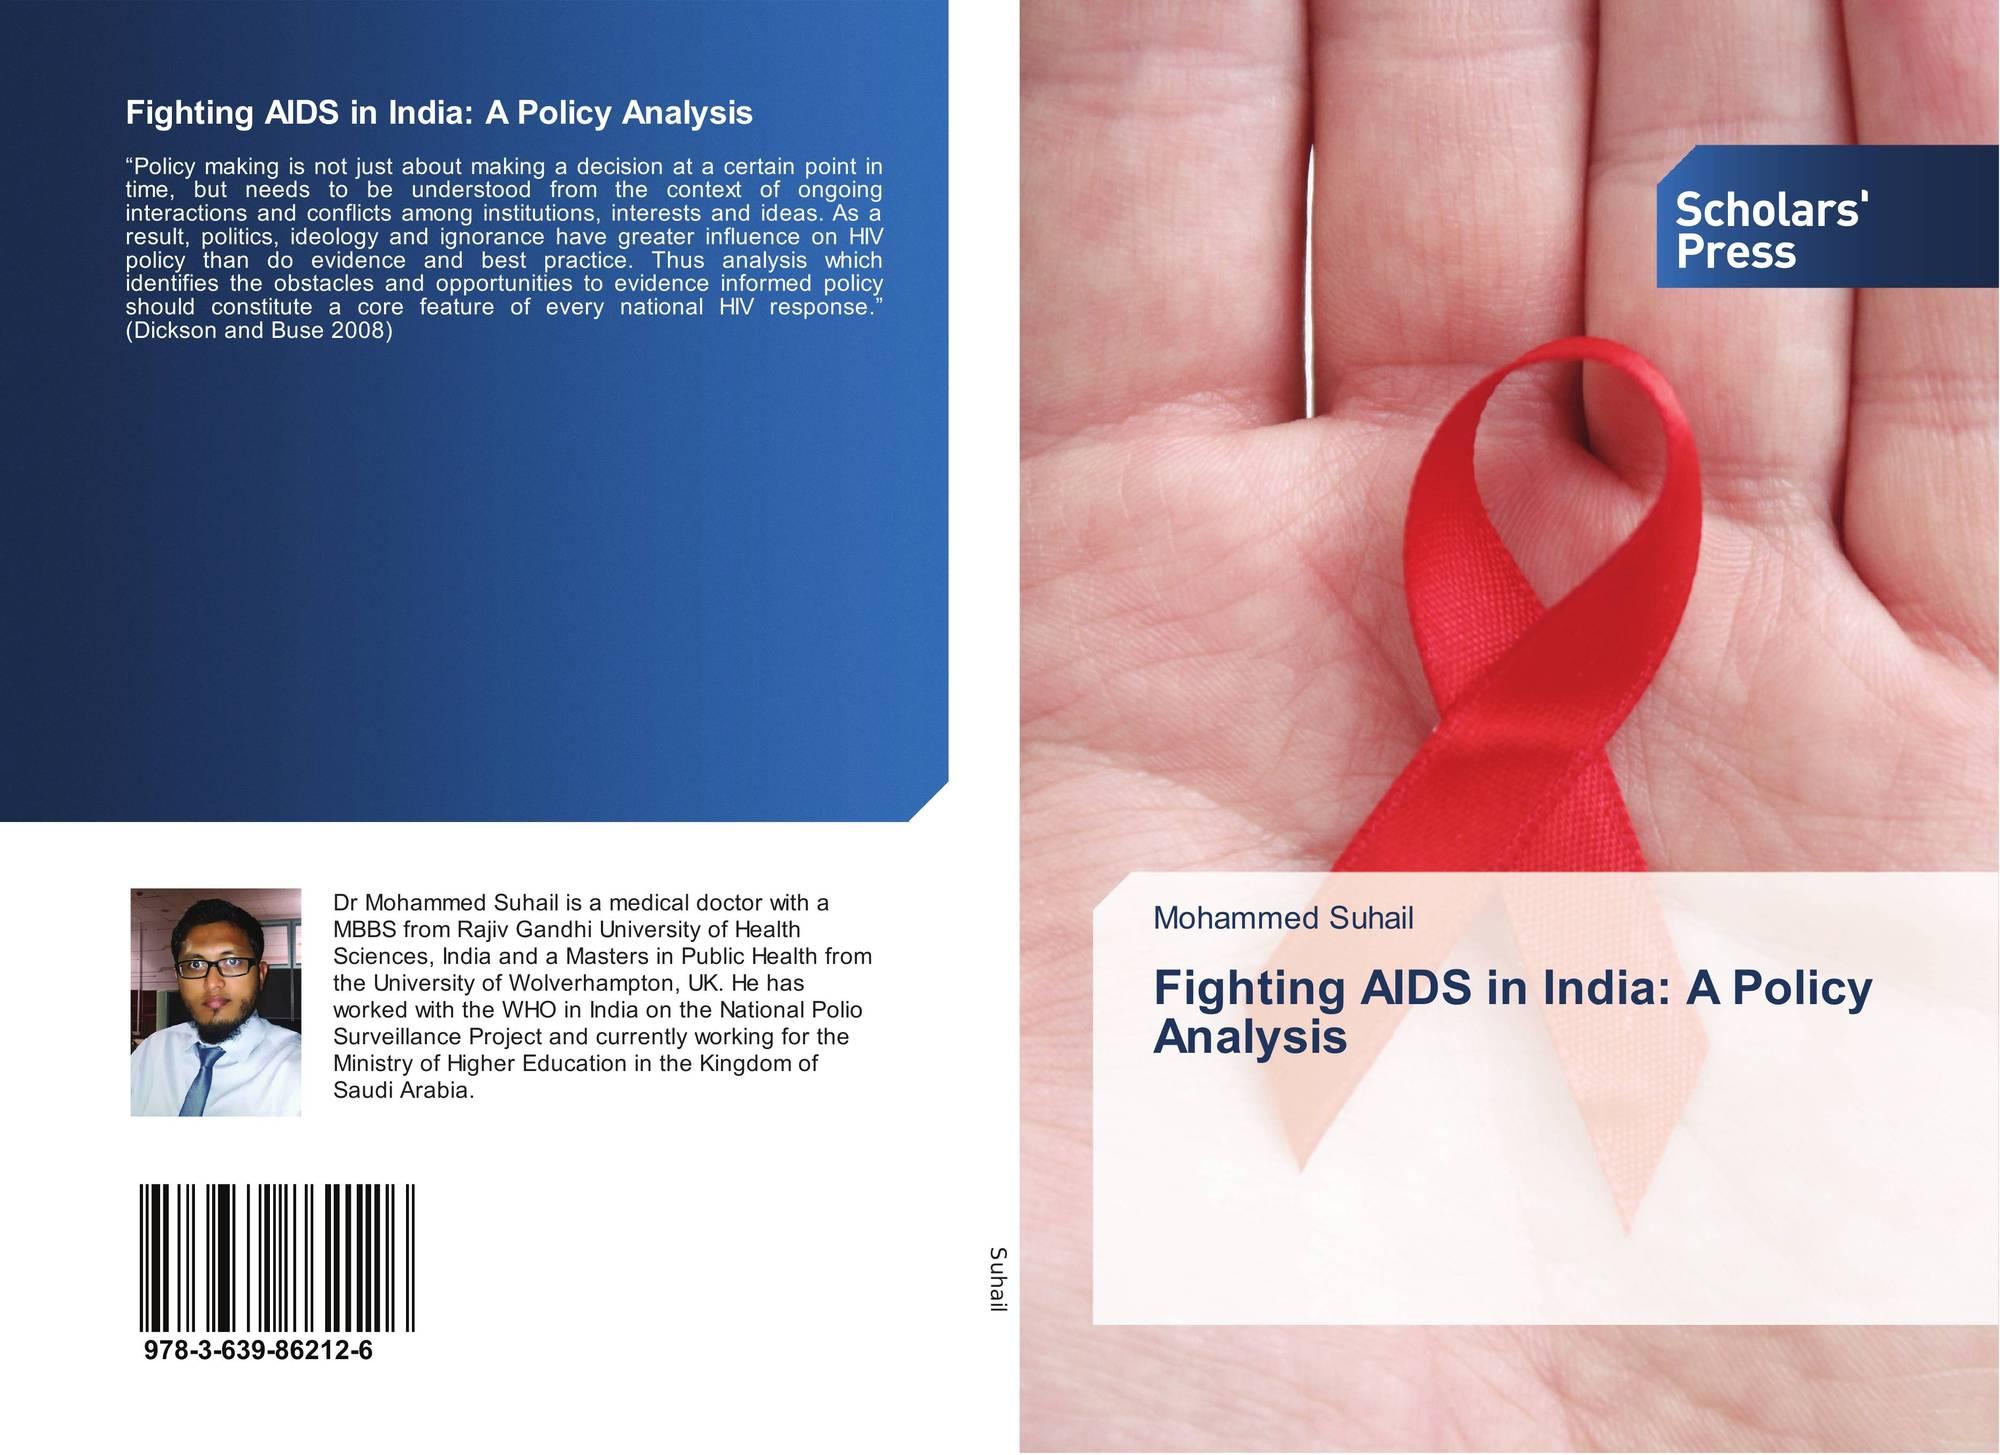 an analysis of aids